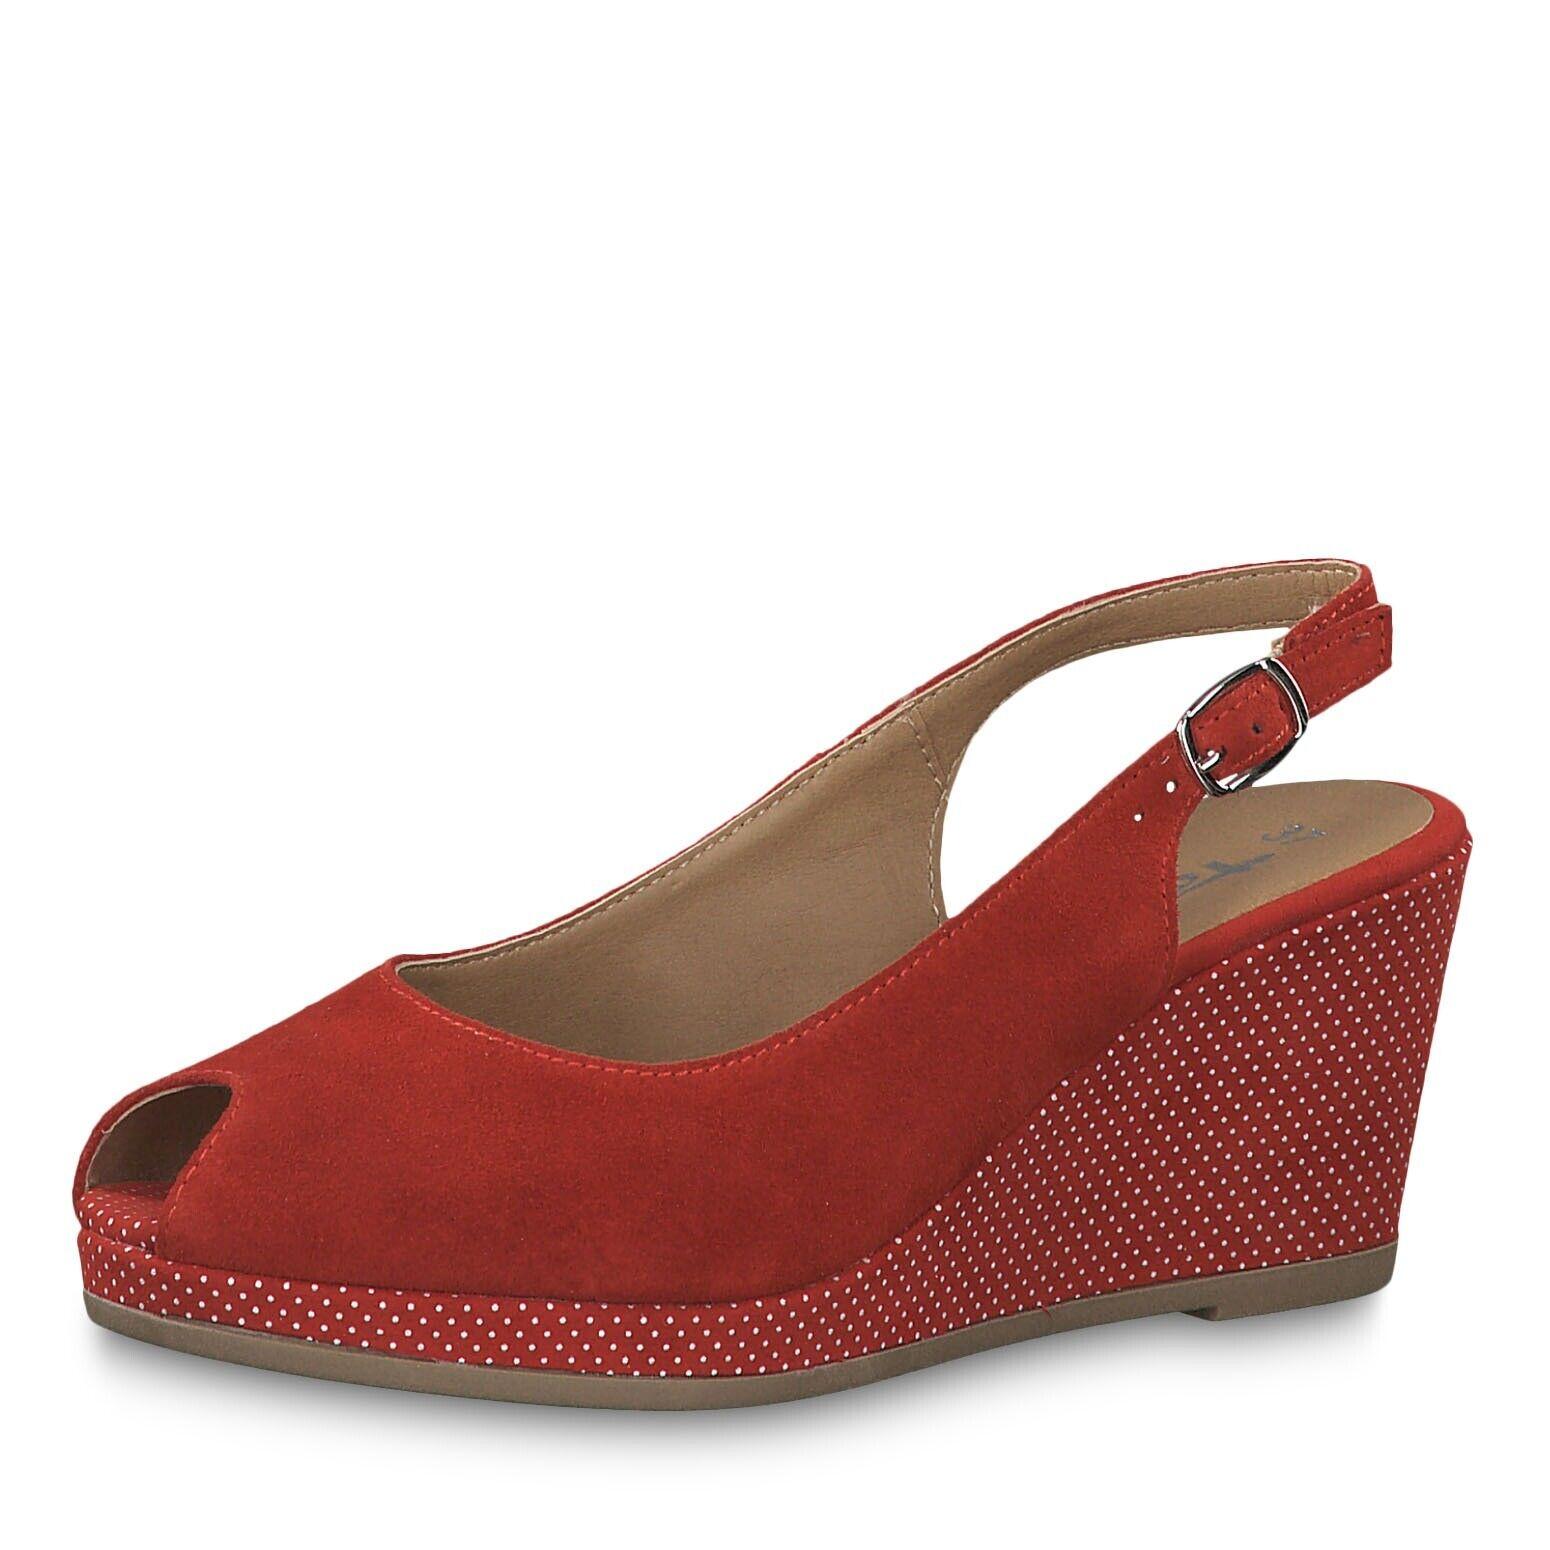 Tamaris 29303 rot Suede & Weiß Polka Dots 40& 039;s Inspirot Peep Toe Wedge Sandal